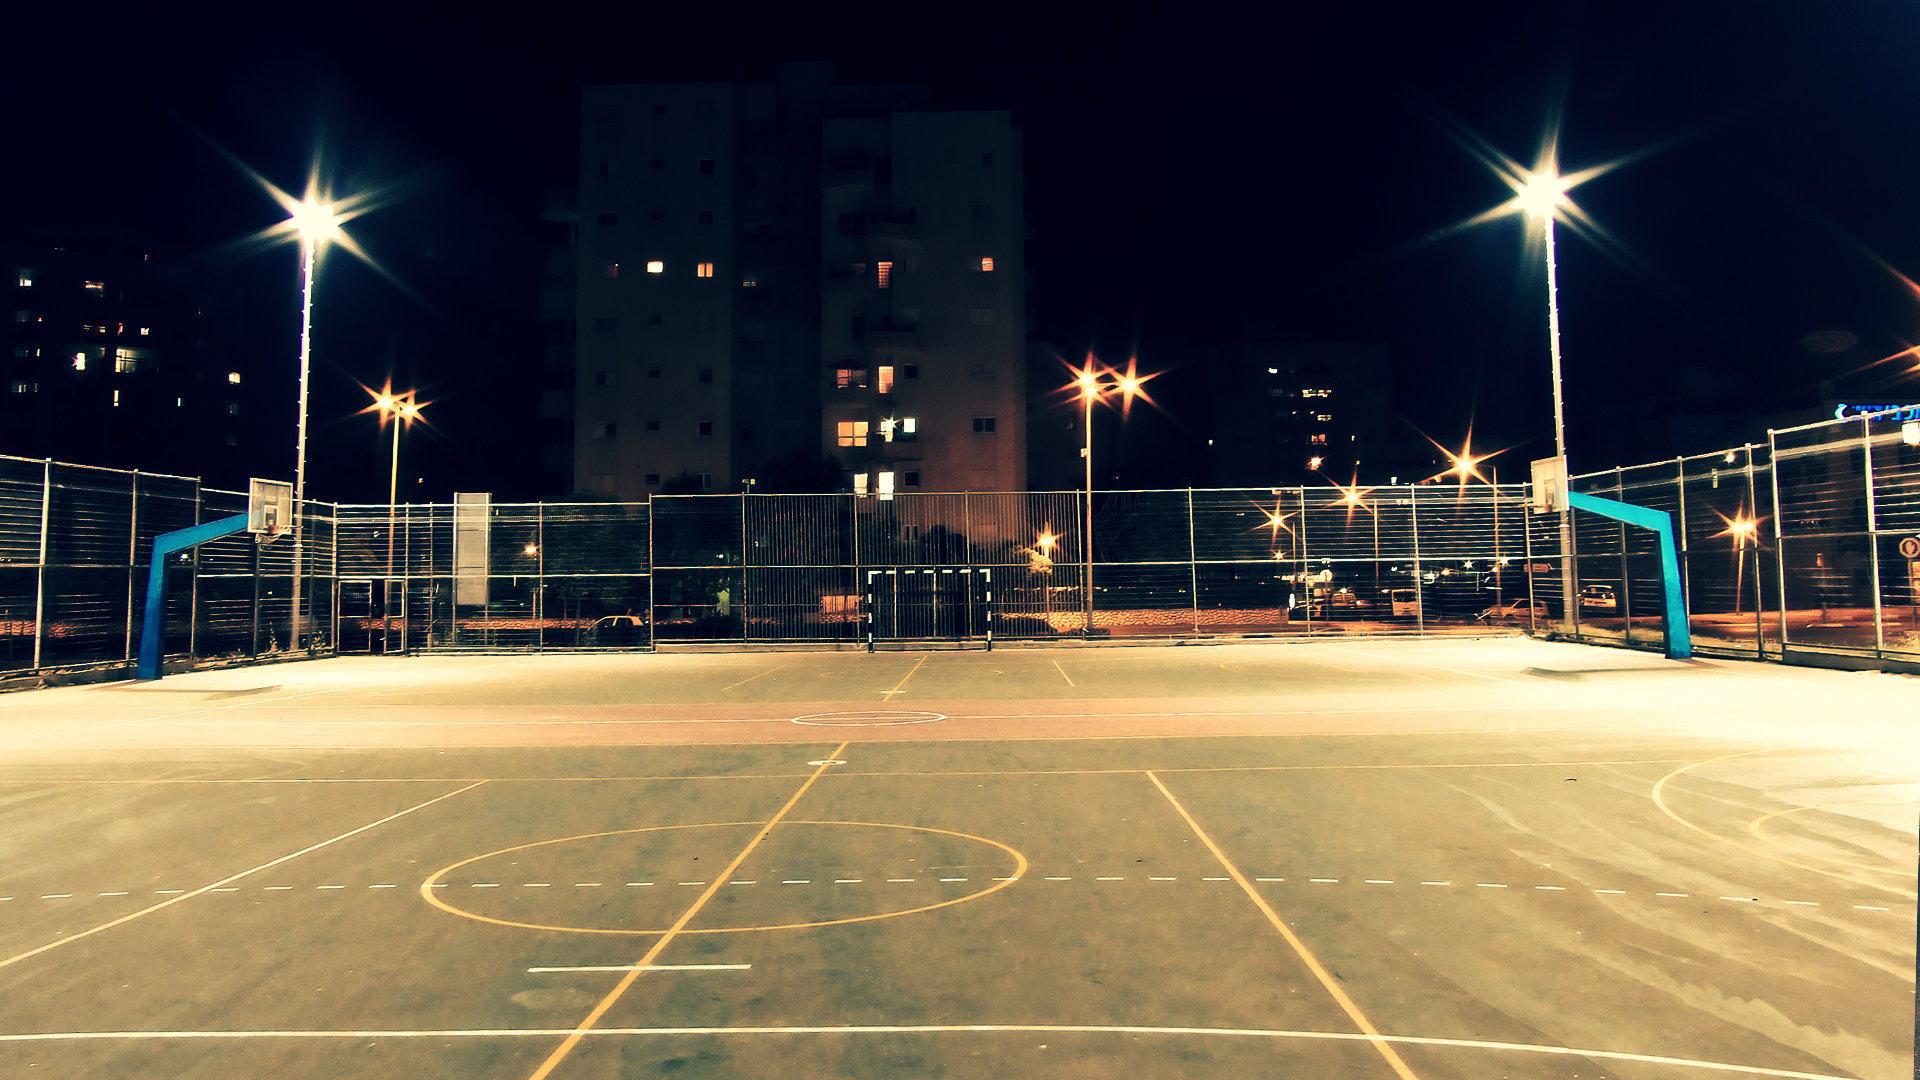 hardwood from court floors floor basketball viewed l